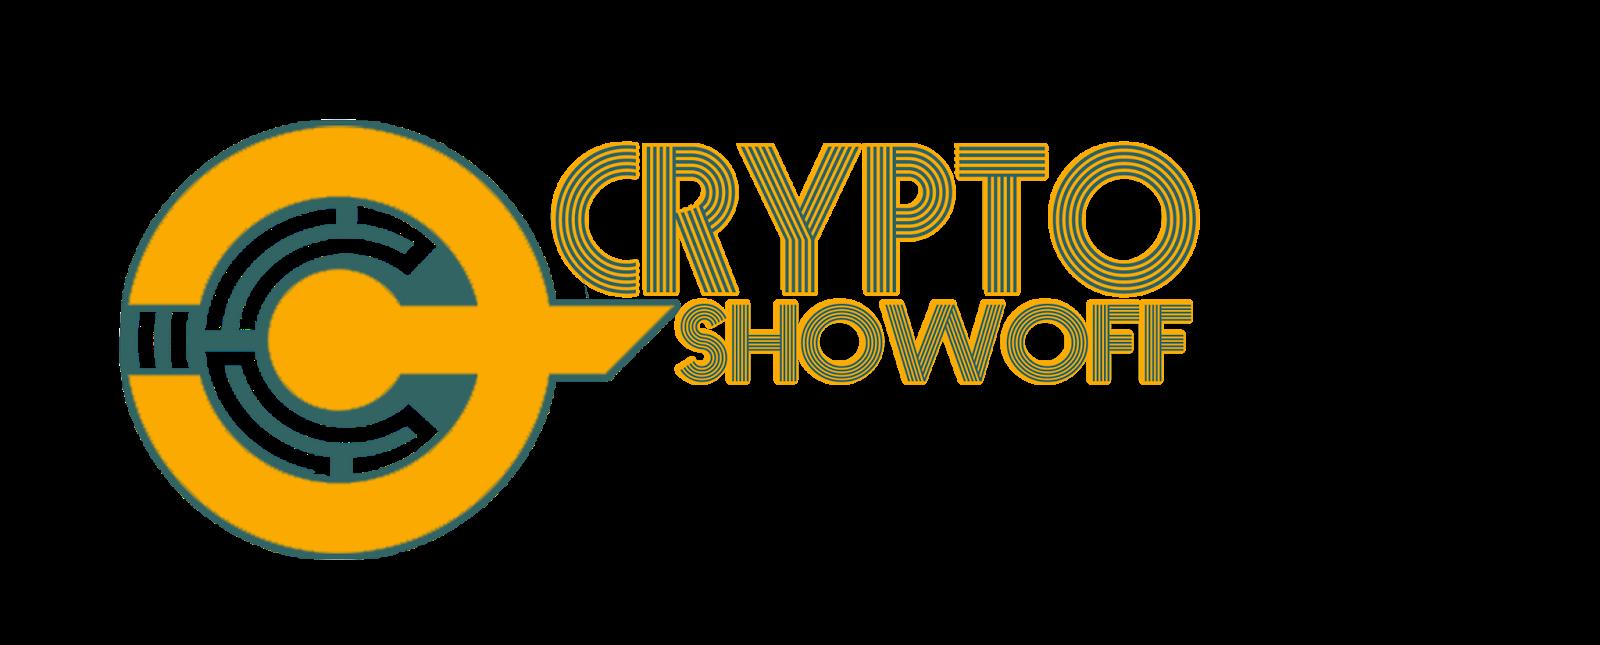 CryptoShowoff.com